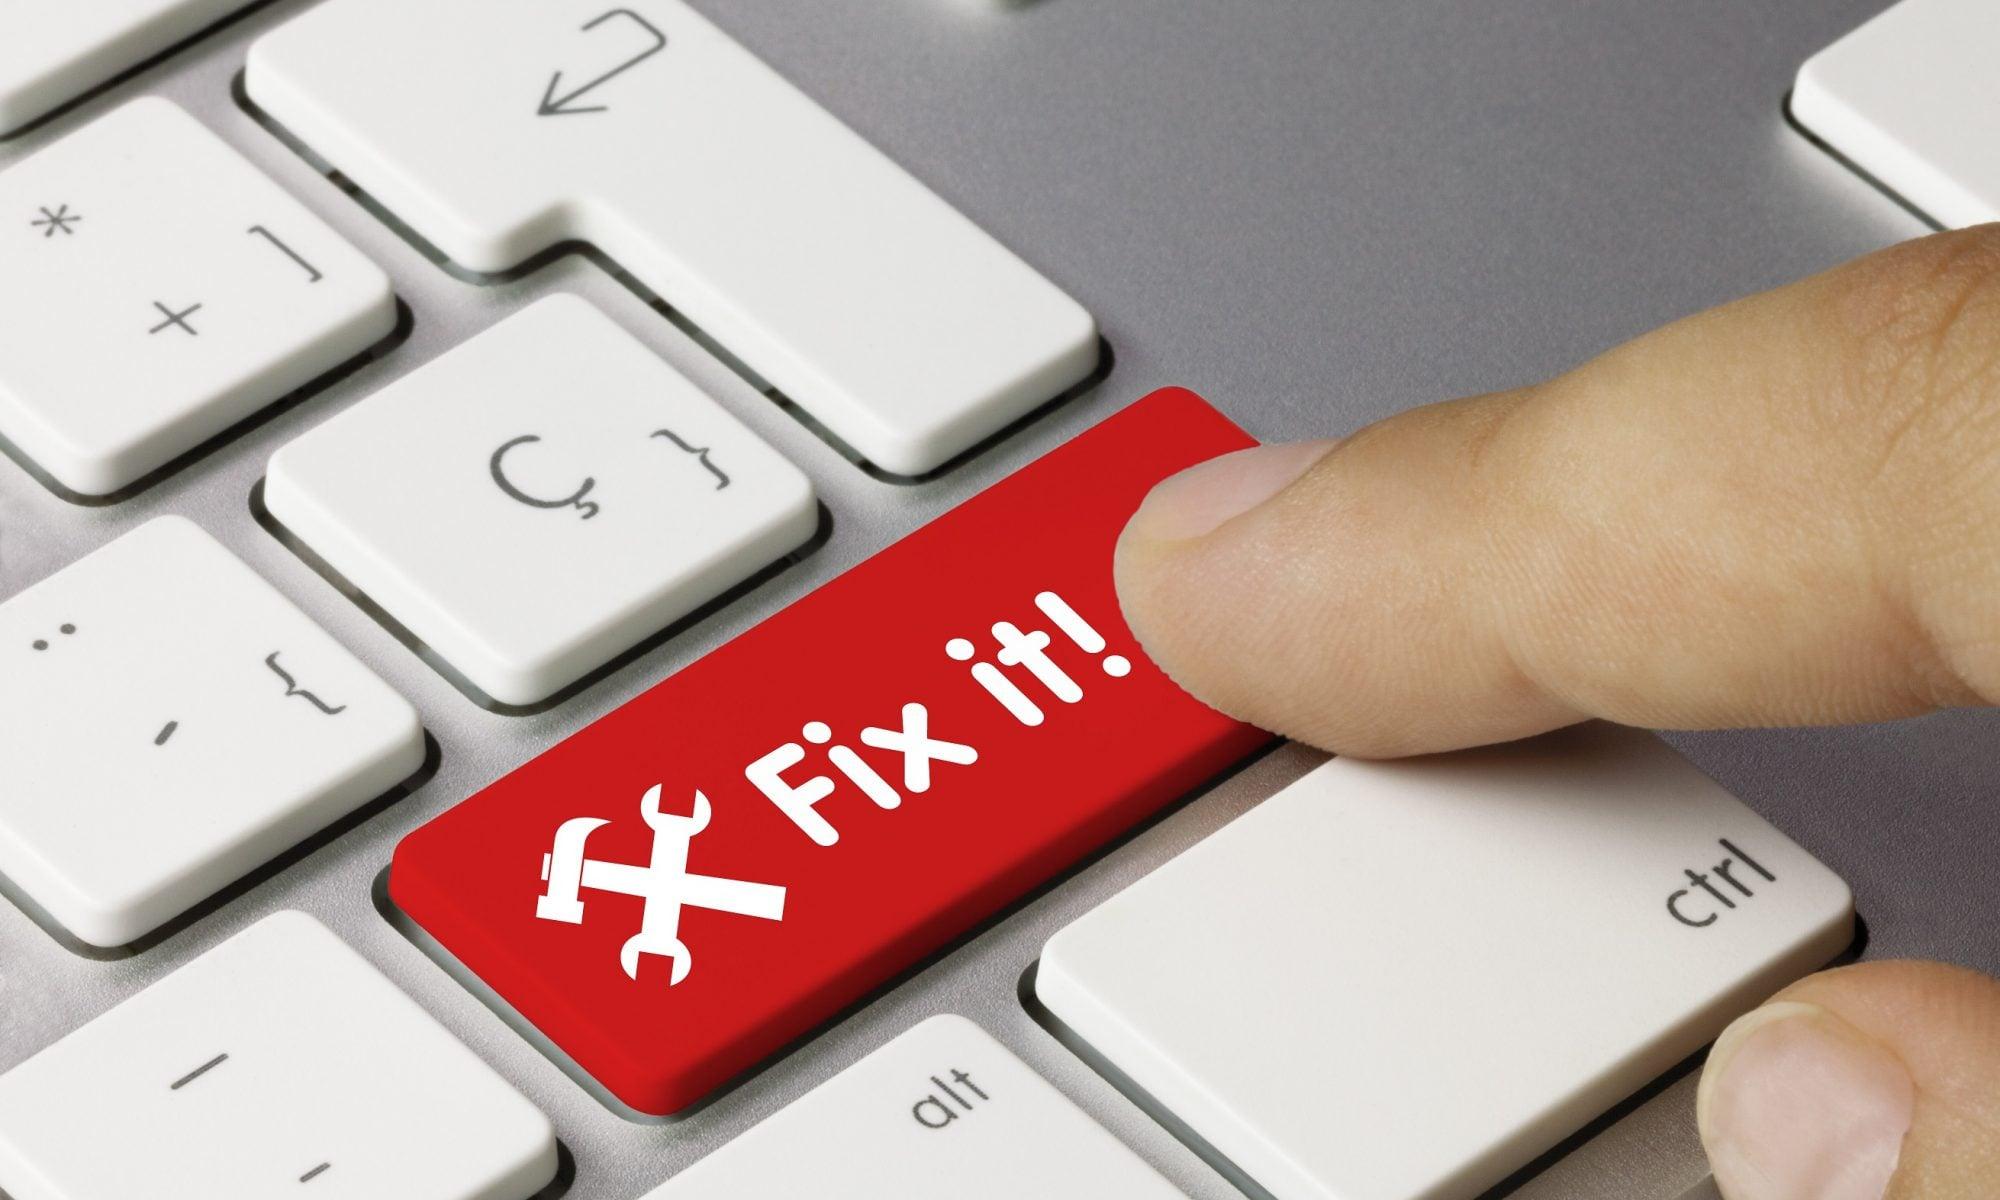 Fix your computer